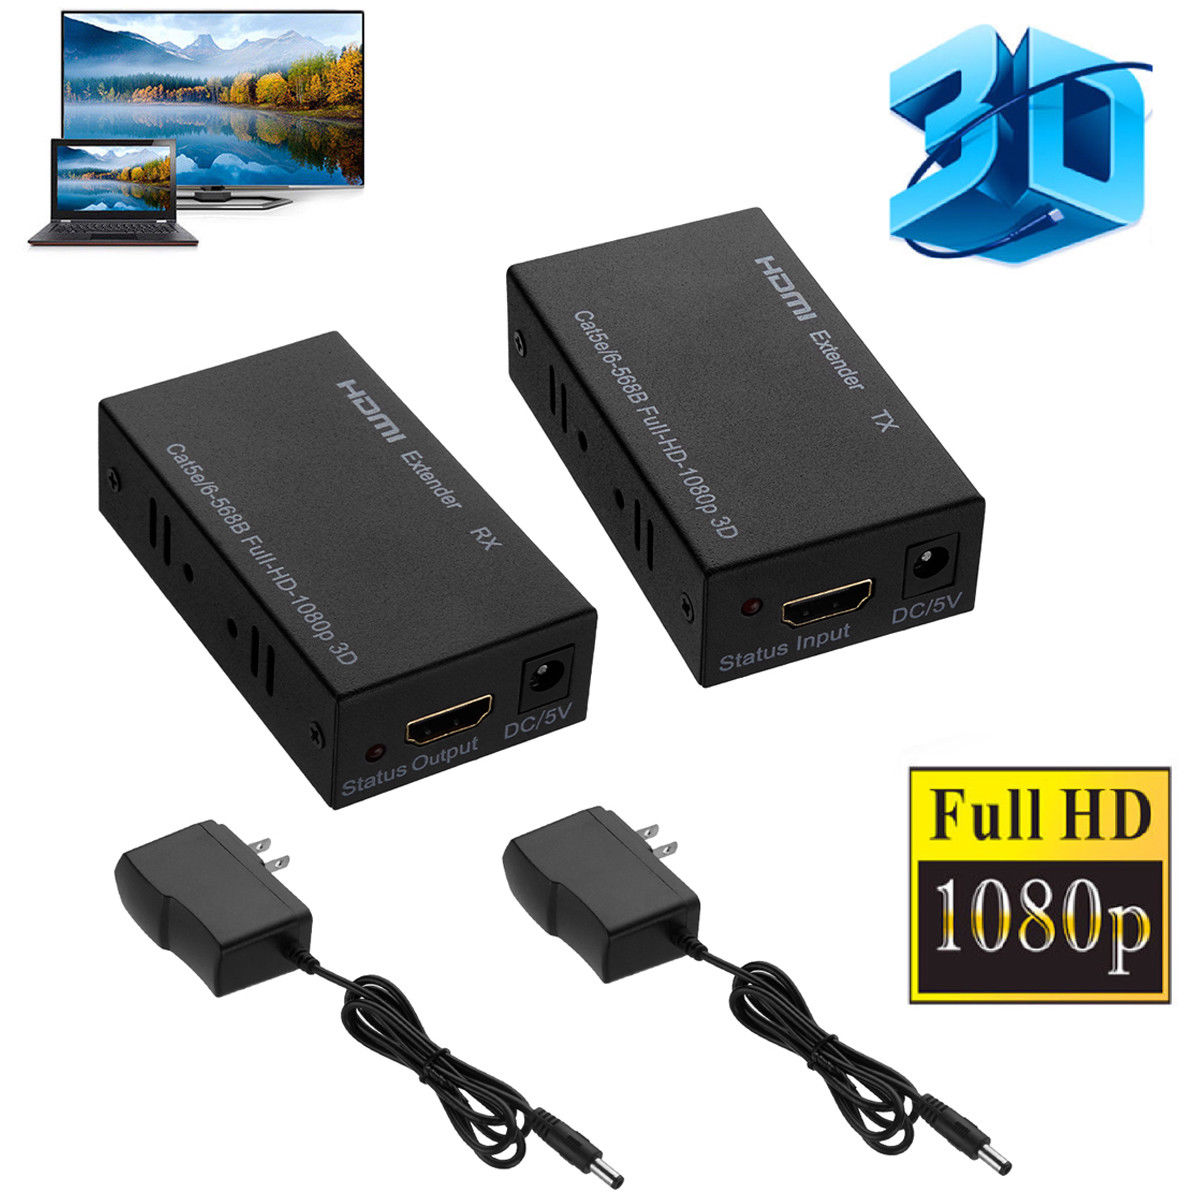 3D 1080P HDMI Network Extender Over Single Cable CAT5E/6 Ethernet RJ45 FHD 60M EU plug